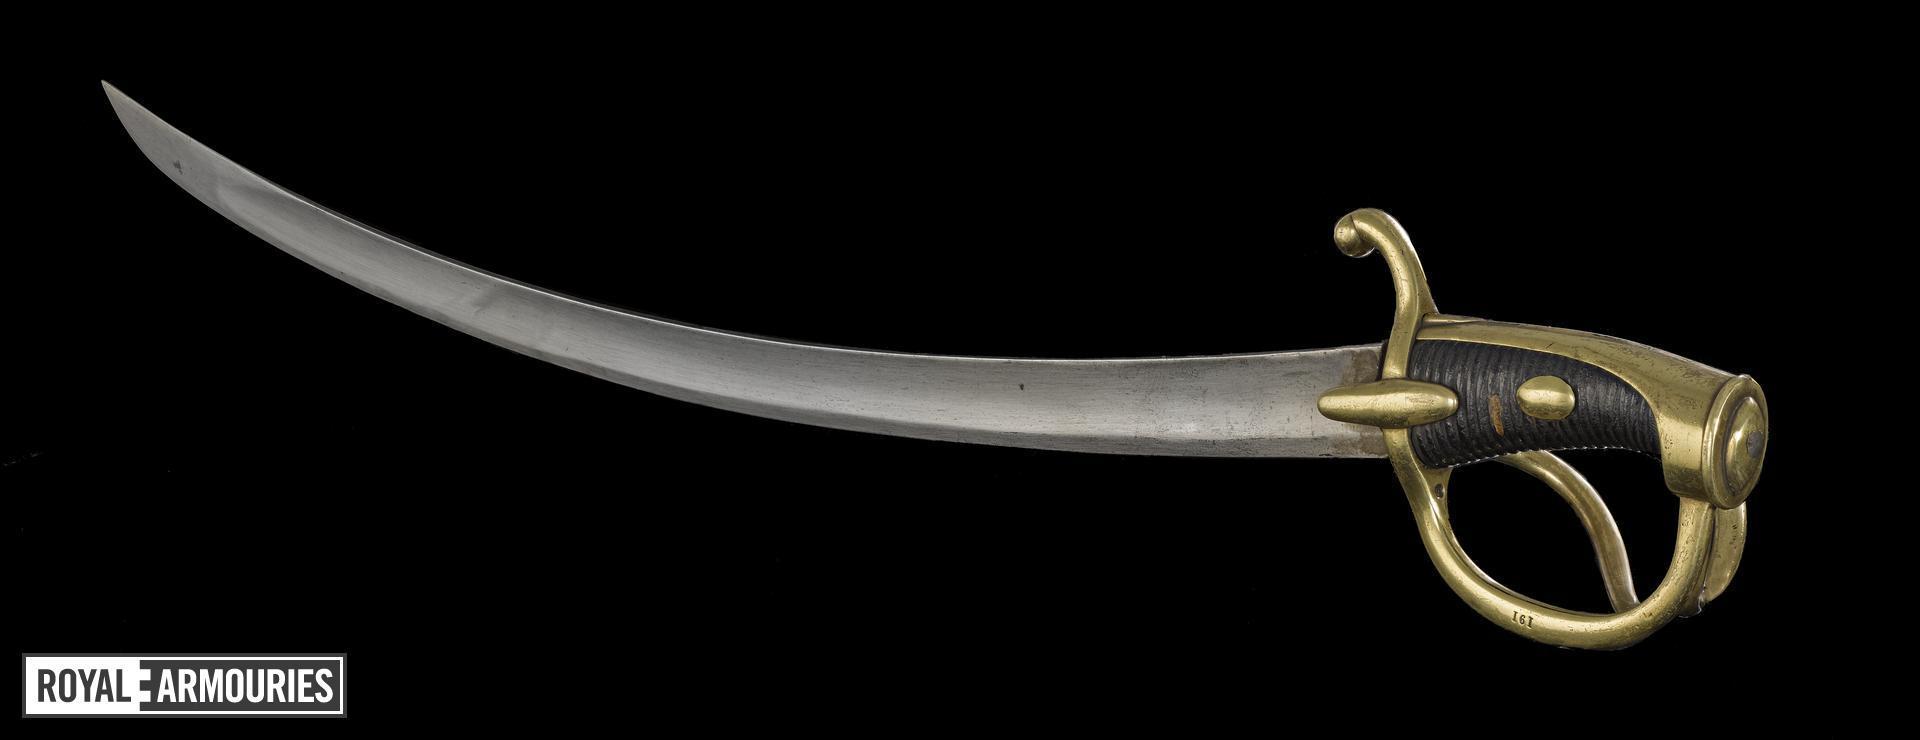 Light Cavalry Sword, France, 1813 (IX.1133)